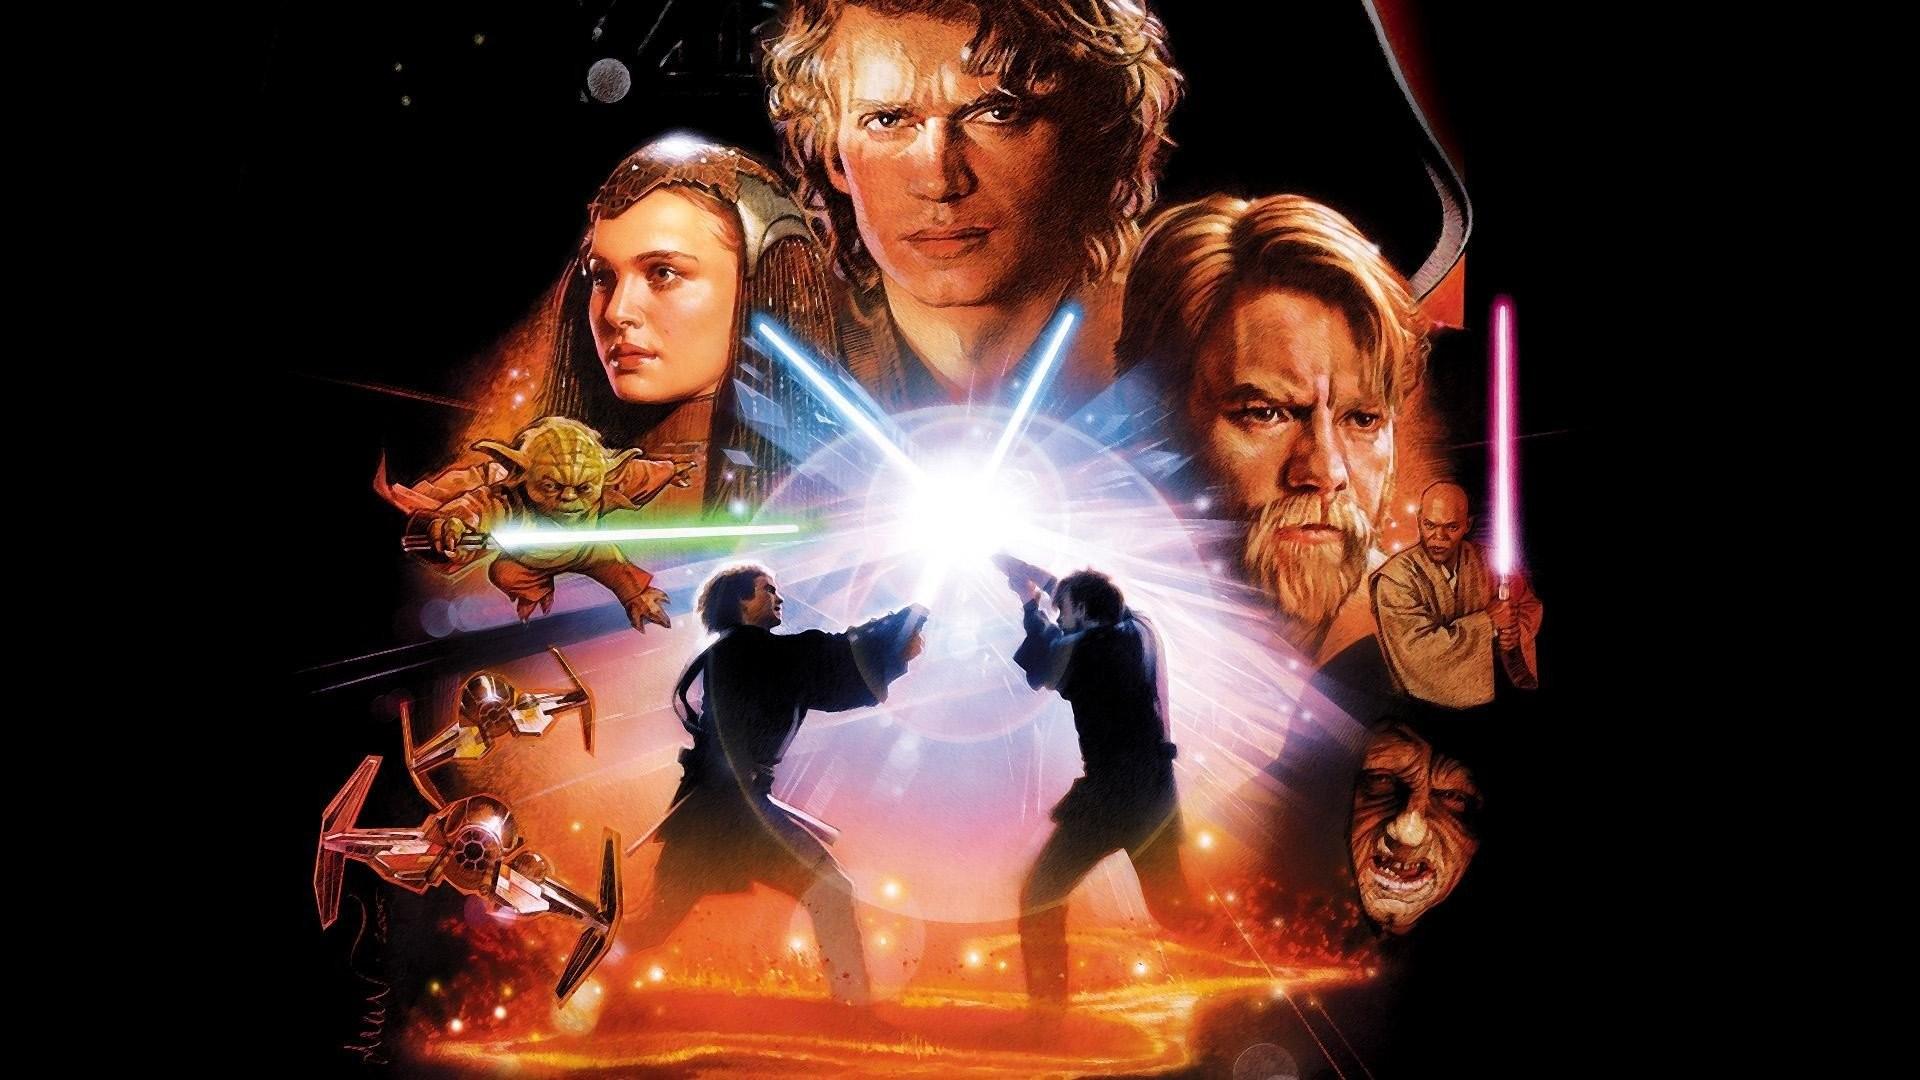 Movies Star Wars Episode III – The Revenge Of Sith Anakin Skywalker Padme  Amidala Obi-Wan Kenobi …